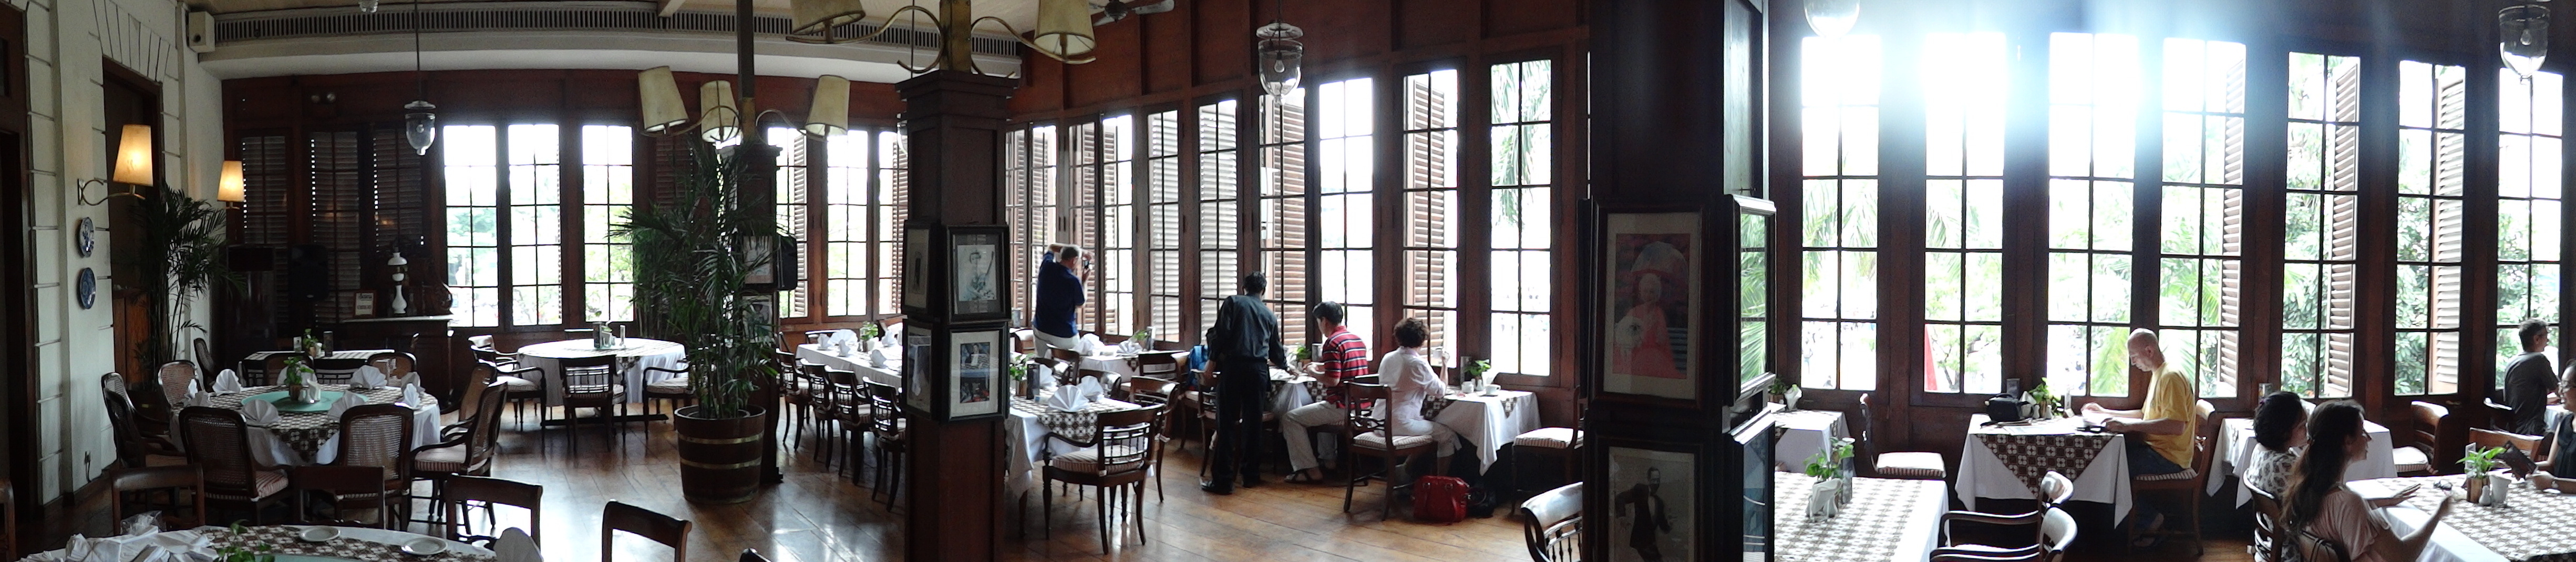 Panorama of interior cafe batavia construction